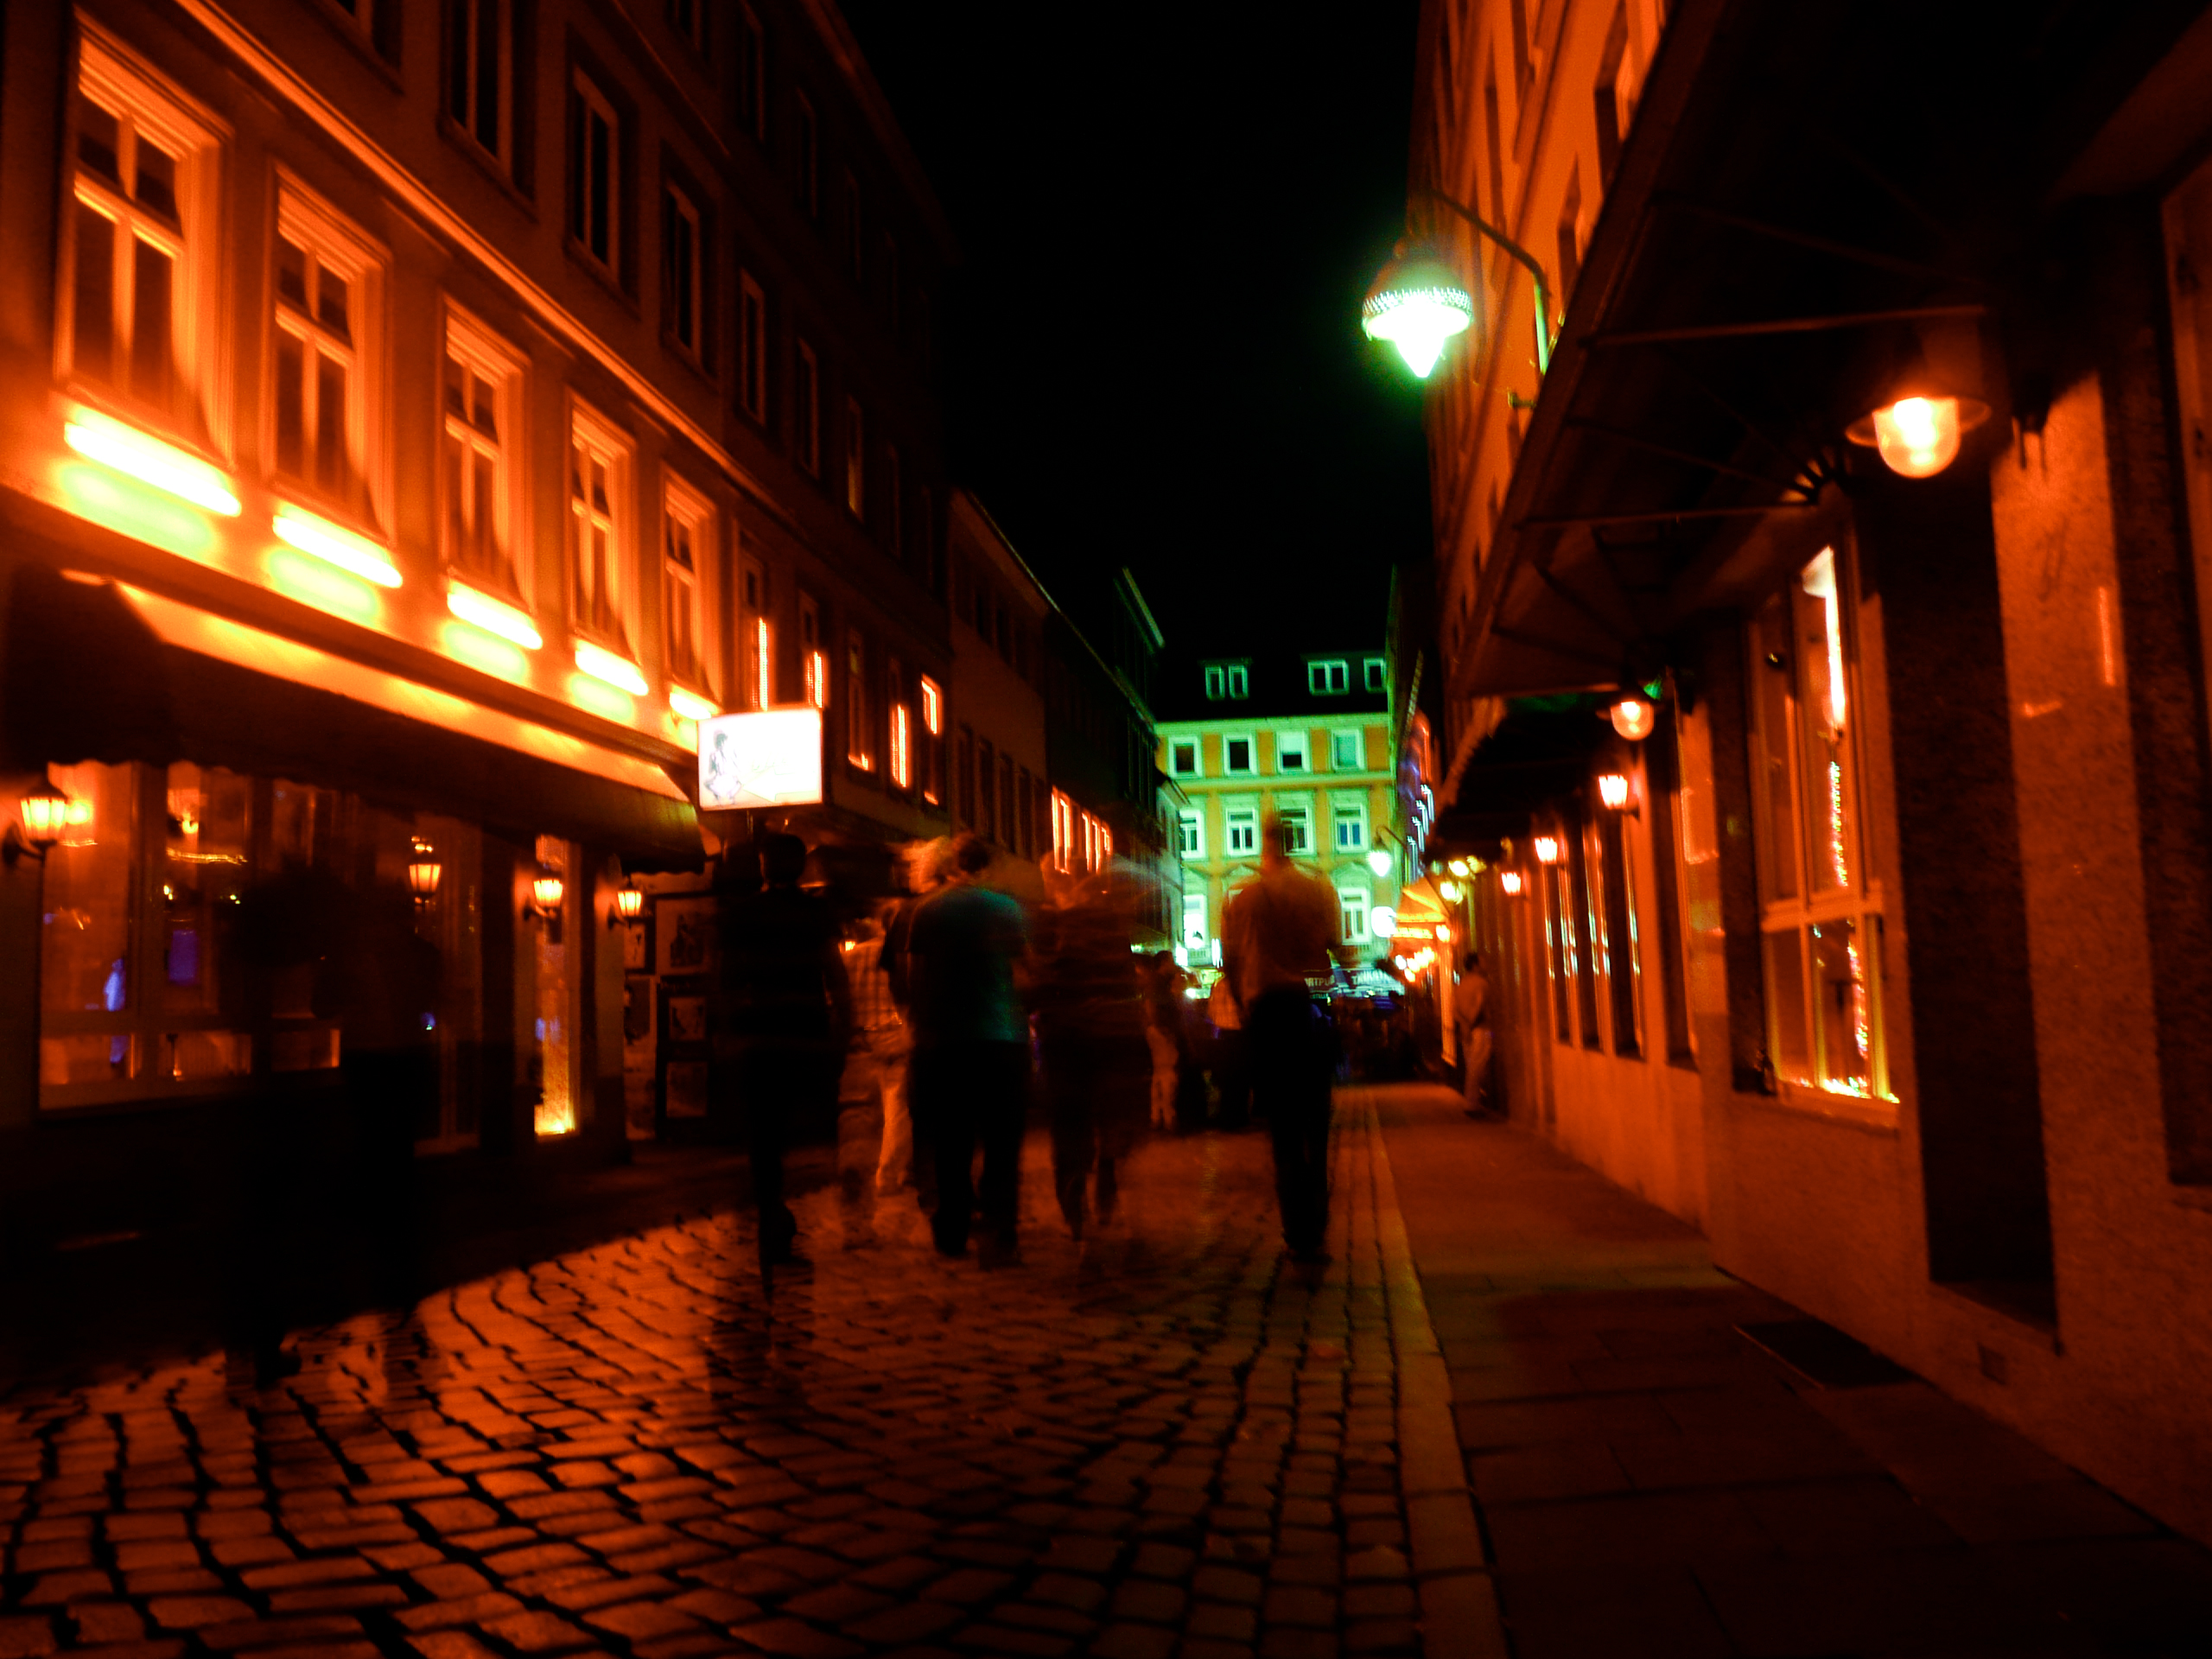 Herbertstrasse (odnoga Reeperbahn), ulica czerwonych latarni.